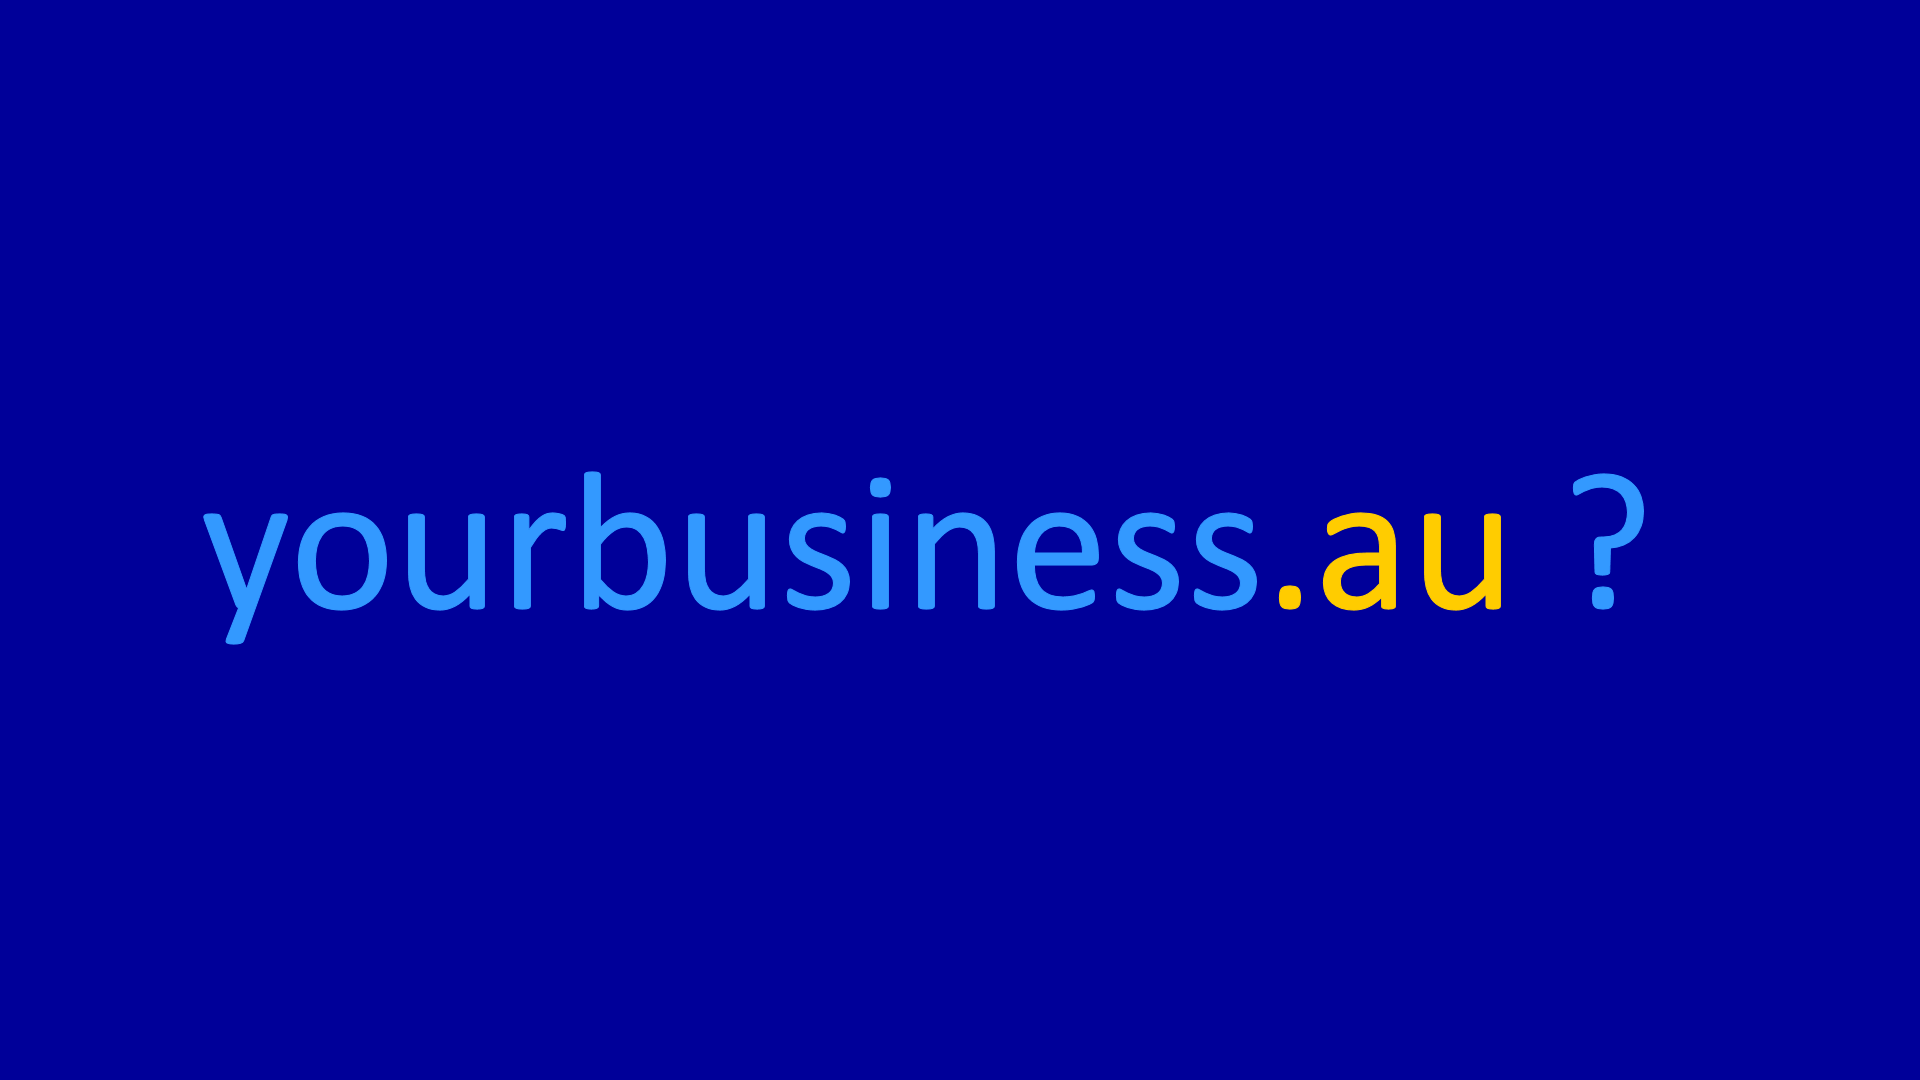 yourbusiness.au?